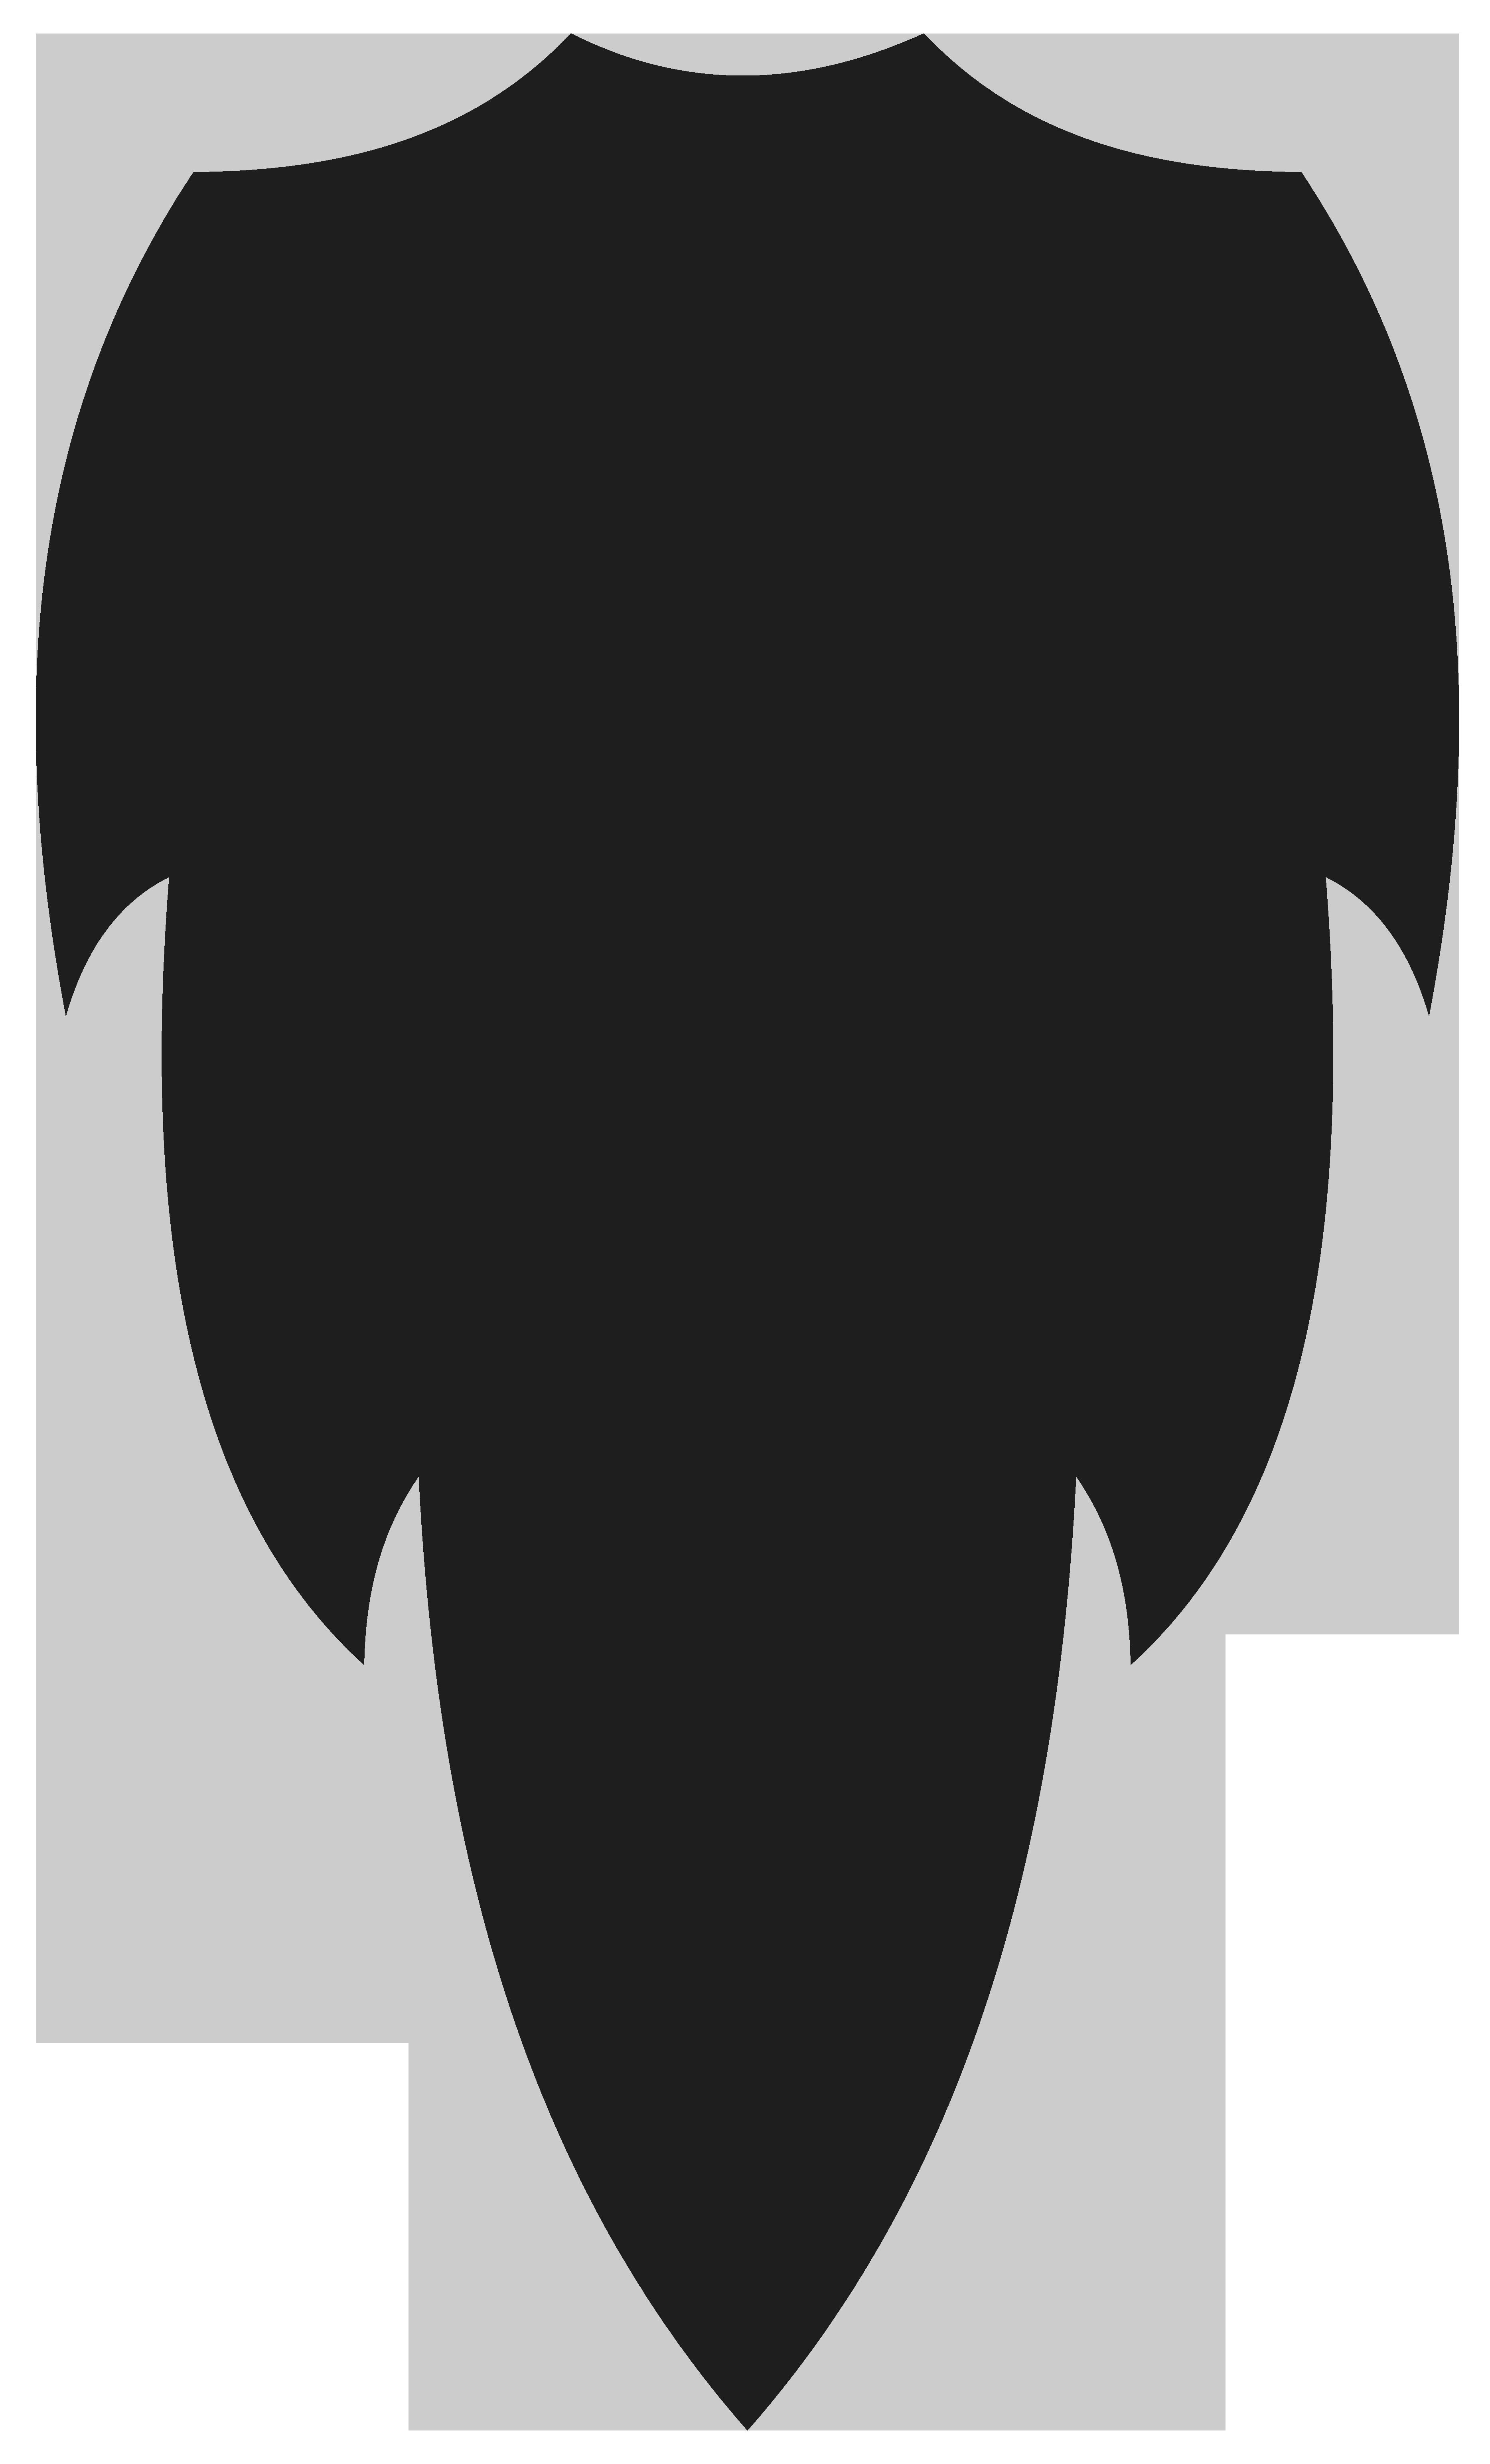 free beard cliparts  download free clip art  free clip art goat clip art free goat clip art silhouette